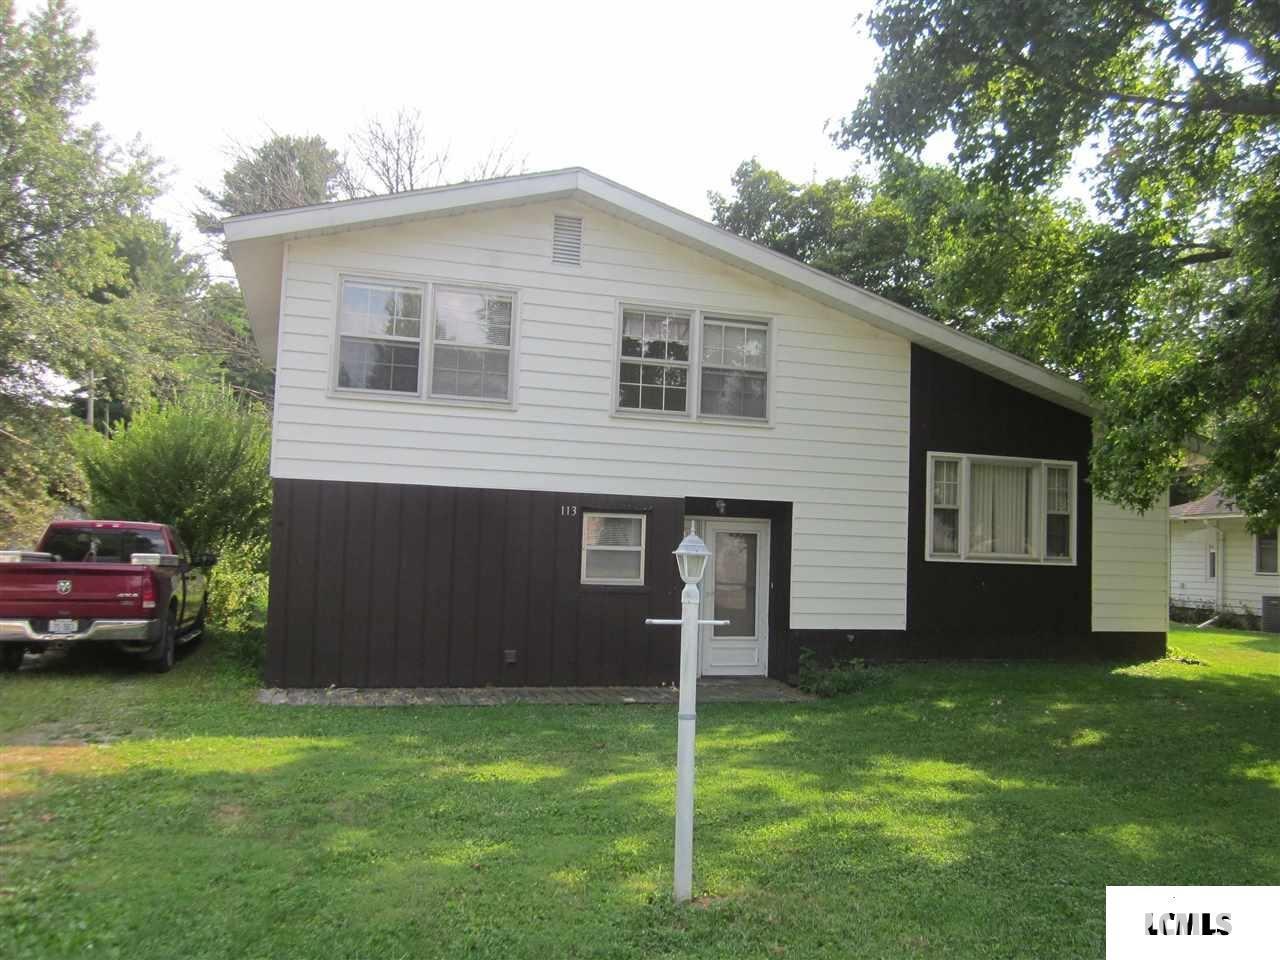 113 W JEFFERSON Property Photo - Mason City, IL real estate listing